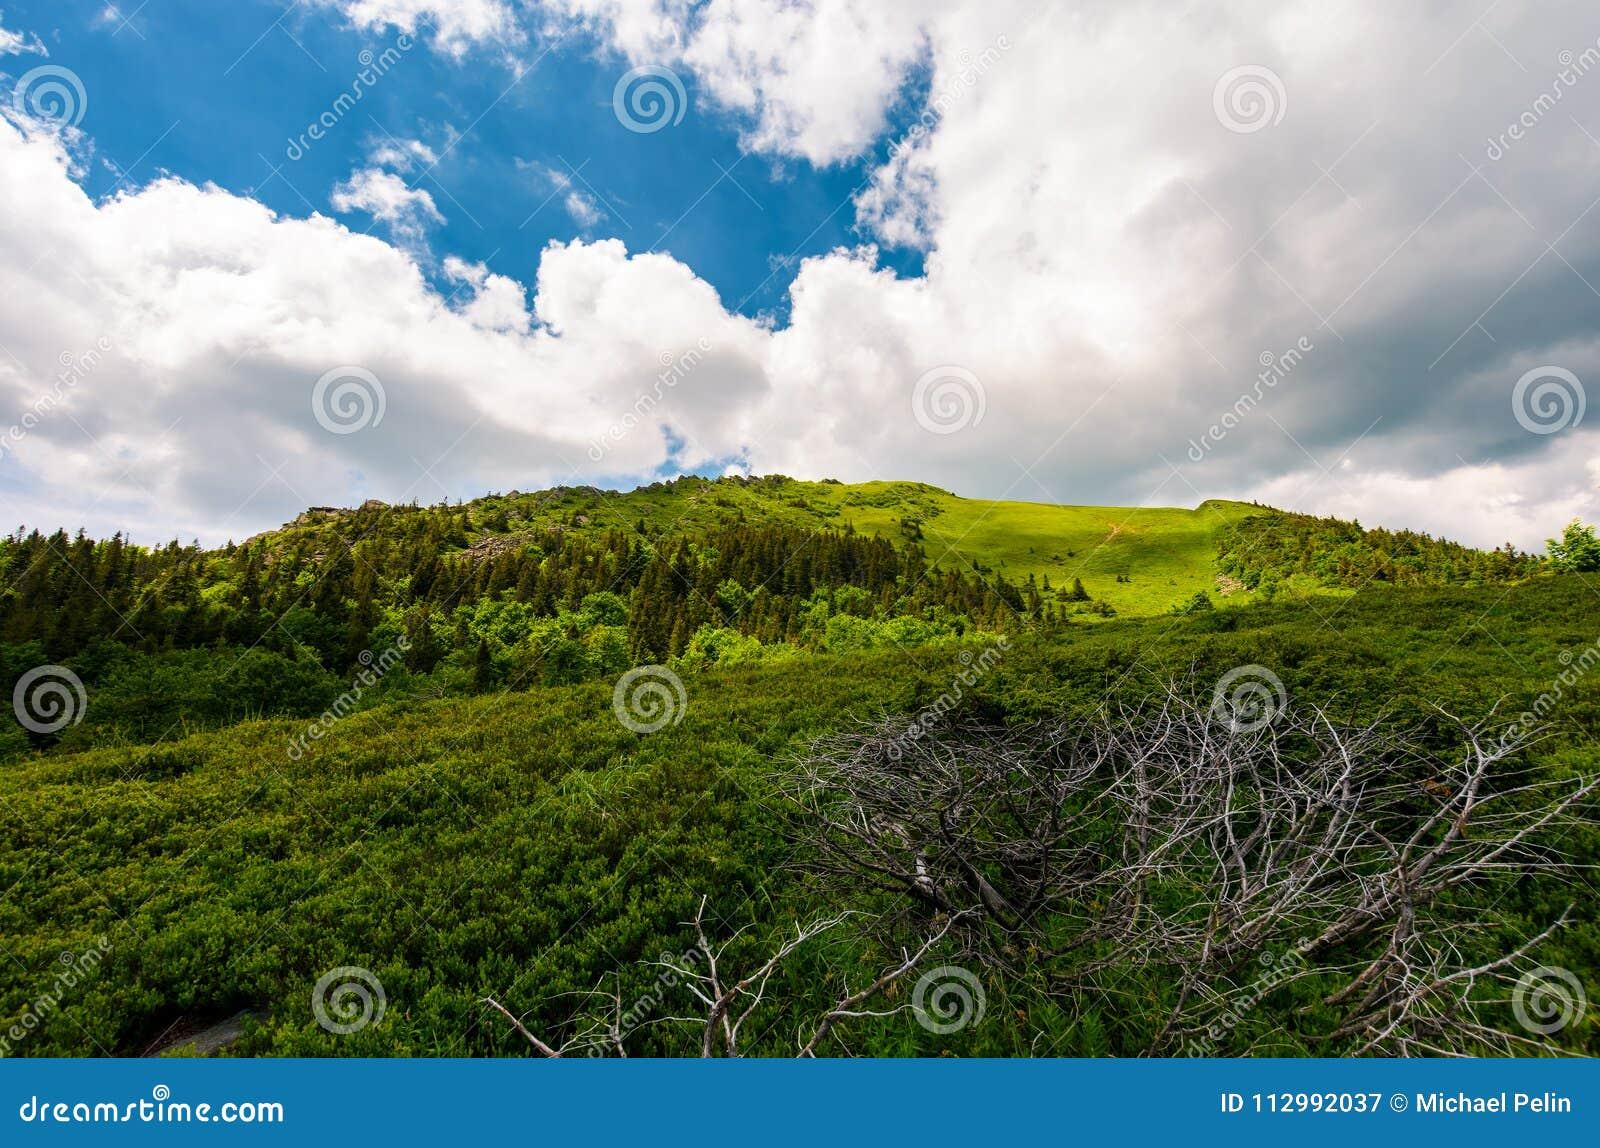 Beautiful mountain landscape in summertime